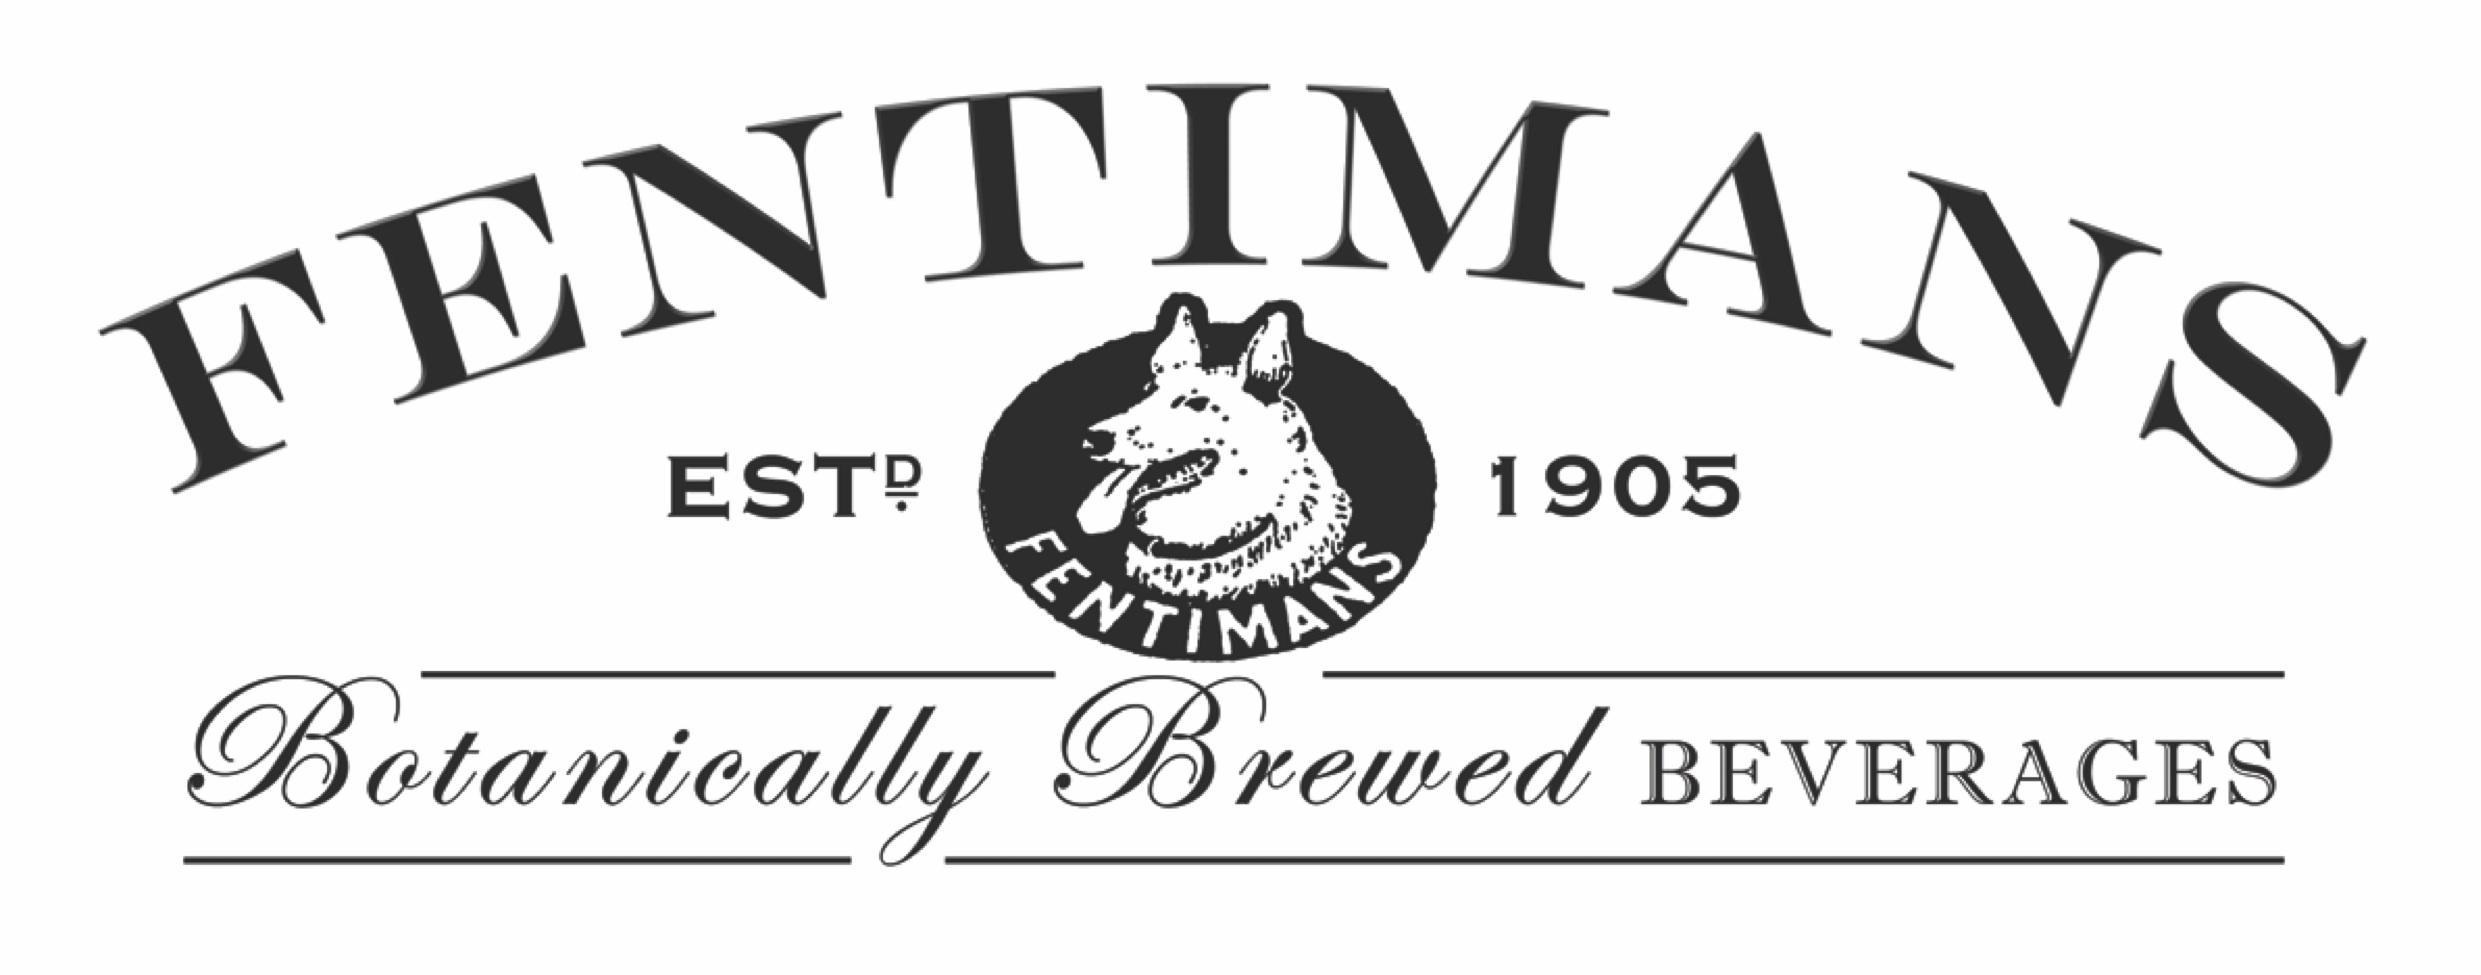 Fentimans Banner Logo-2.jpg